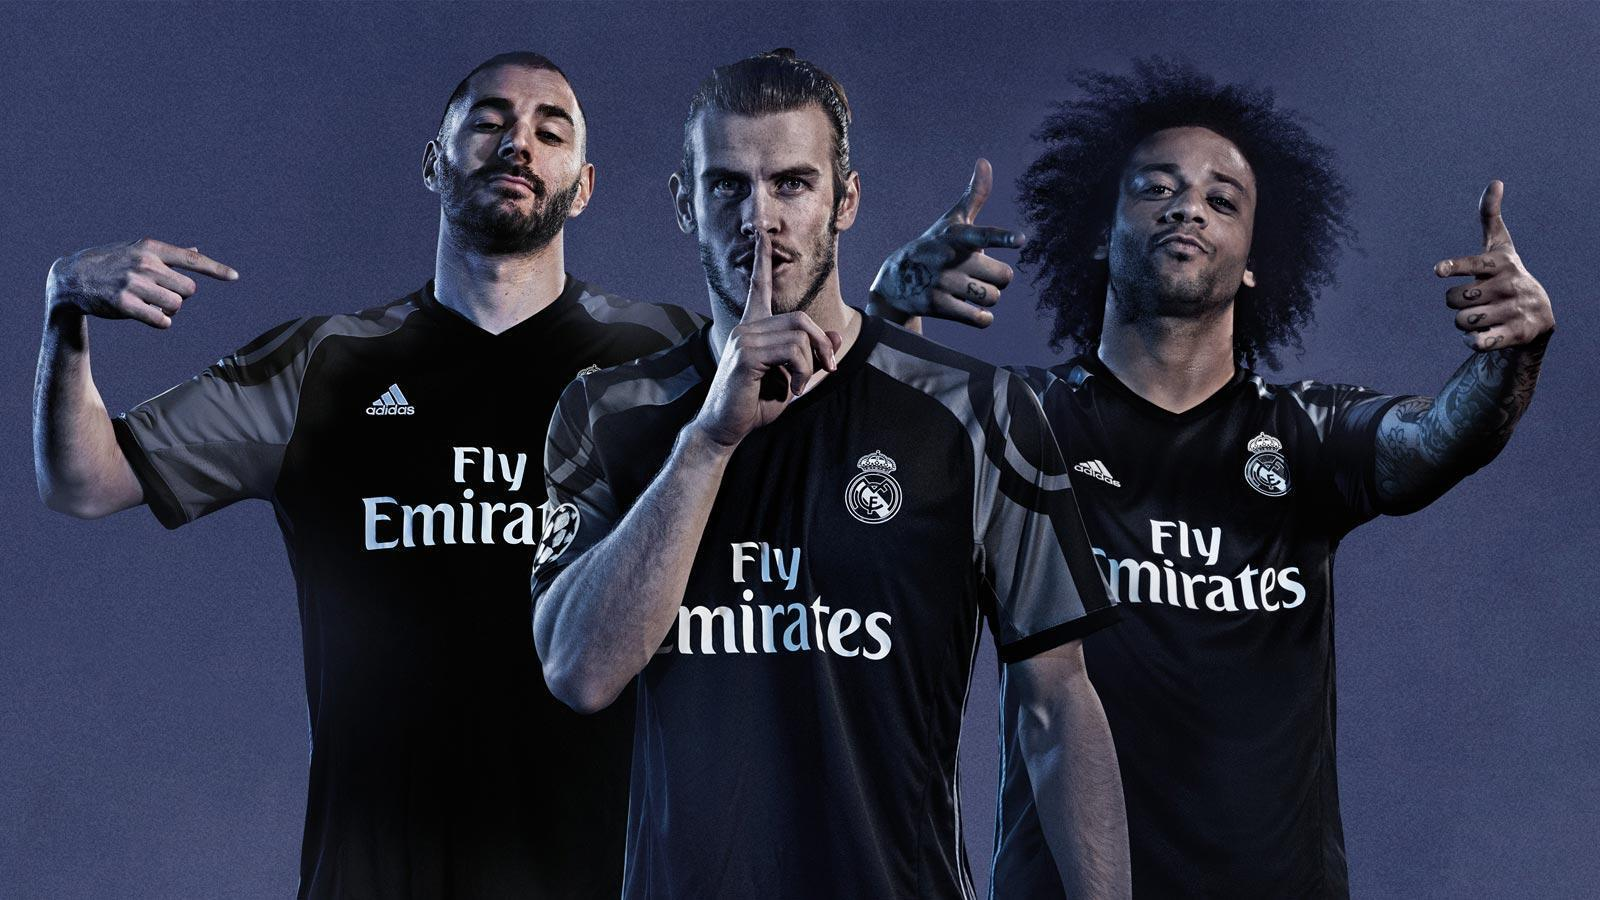 Sport Wallpaper Real Madrid: Real Madrid HD Wallpapers 2017